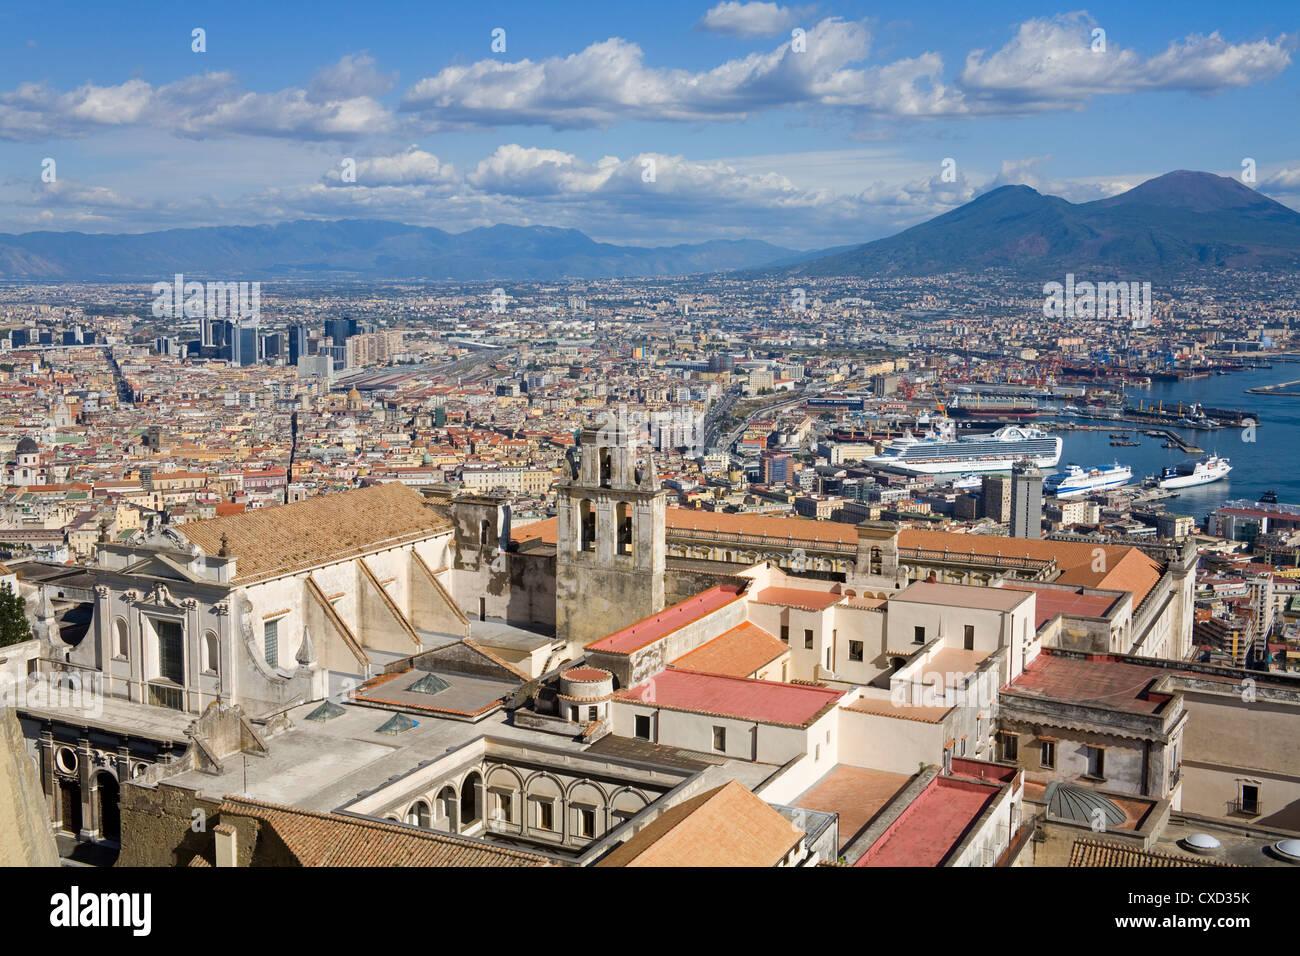 Cerosa di San Martino, Naples, Campania, Italy, Europe - Stock Image